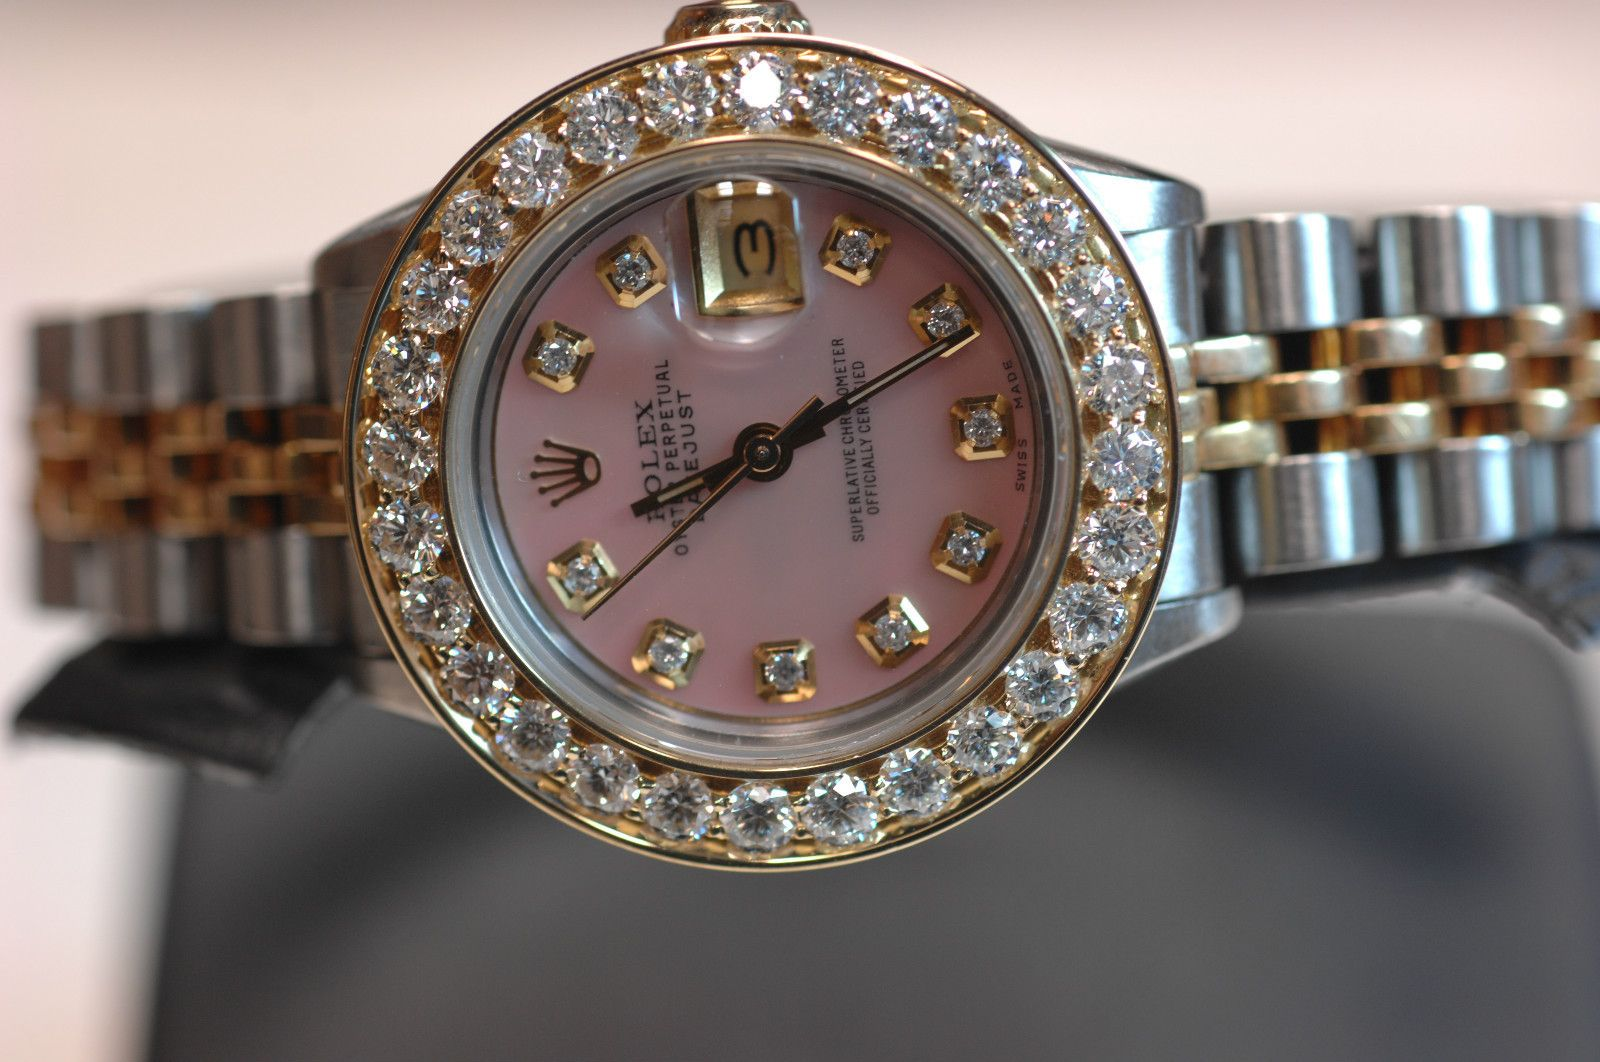 Rolex Datejust Women's Diamond Bezel